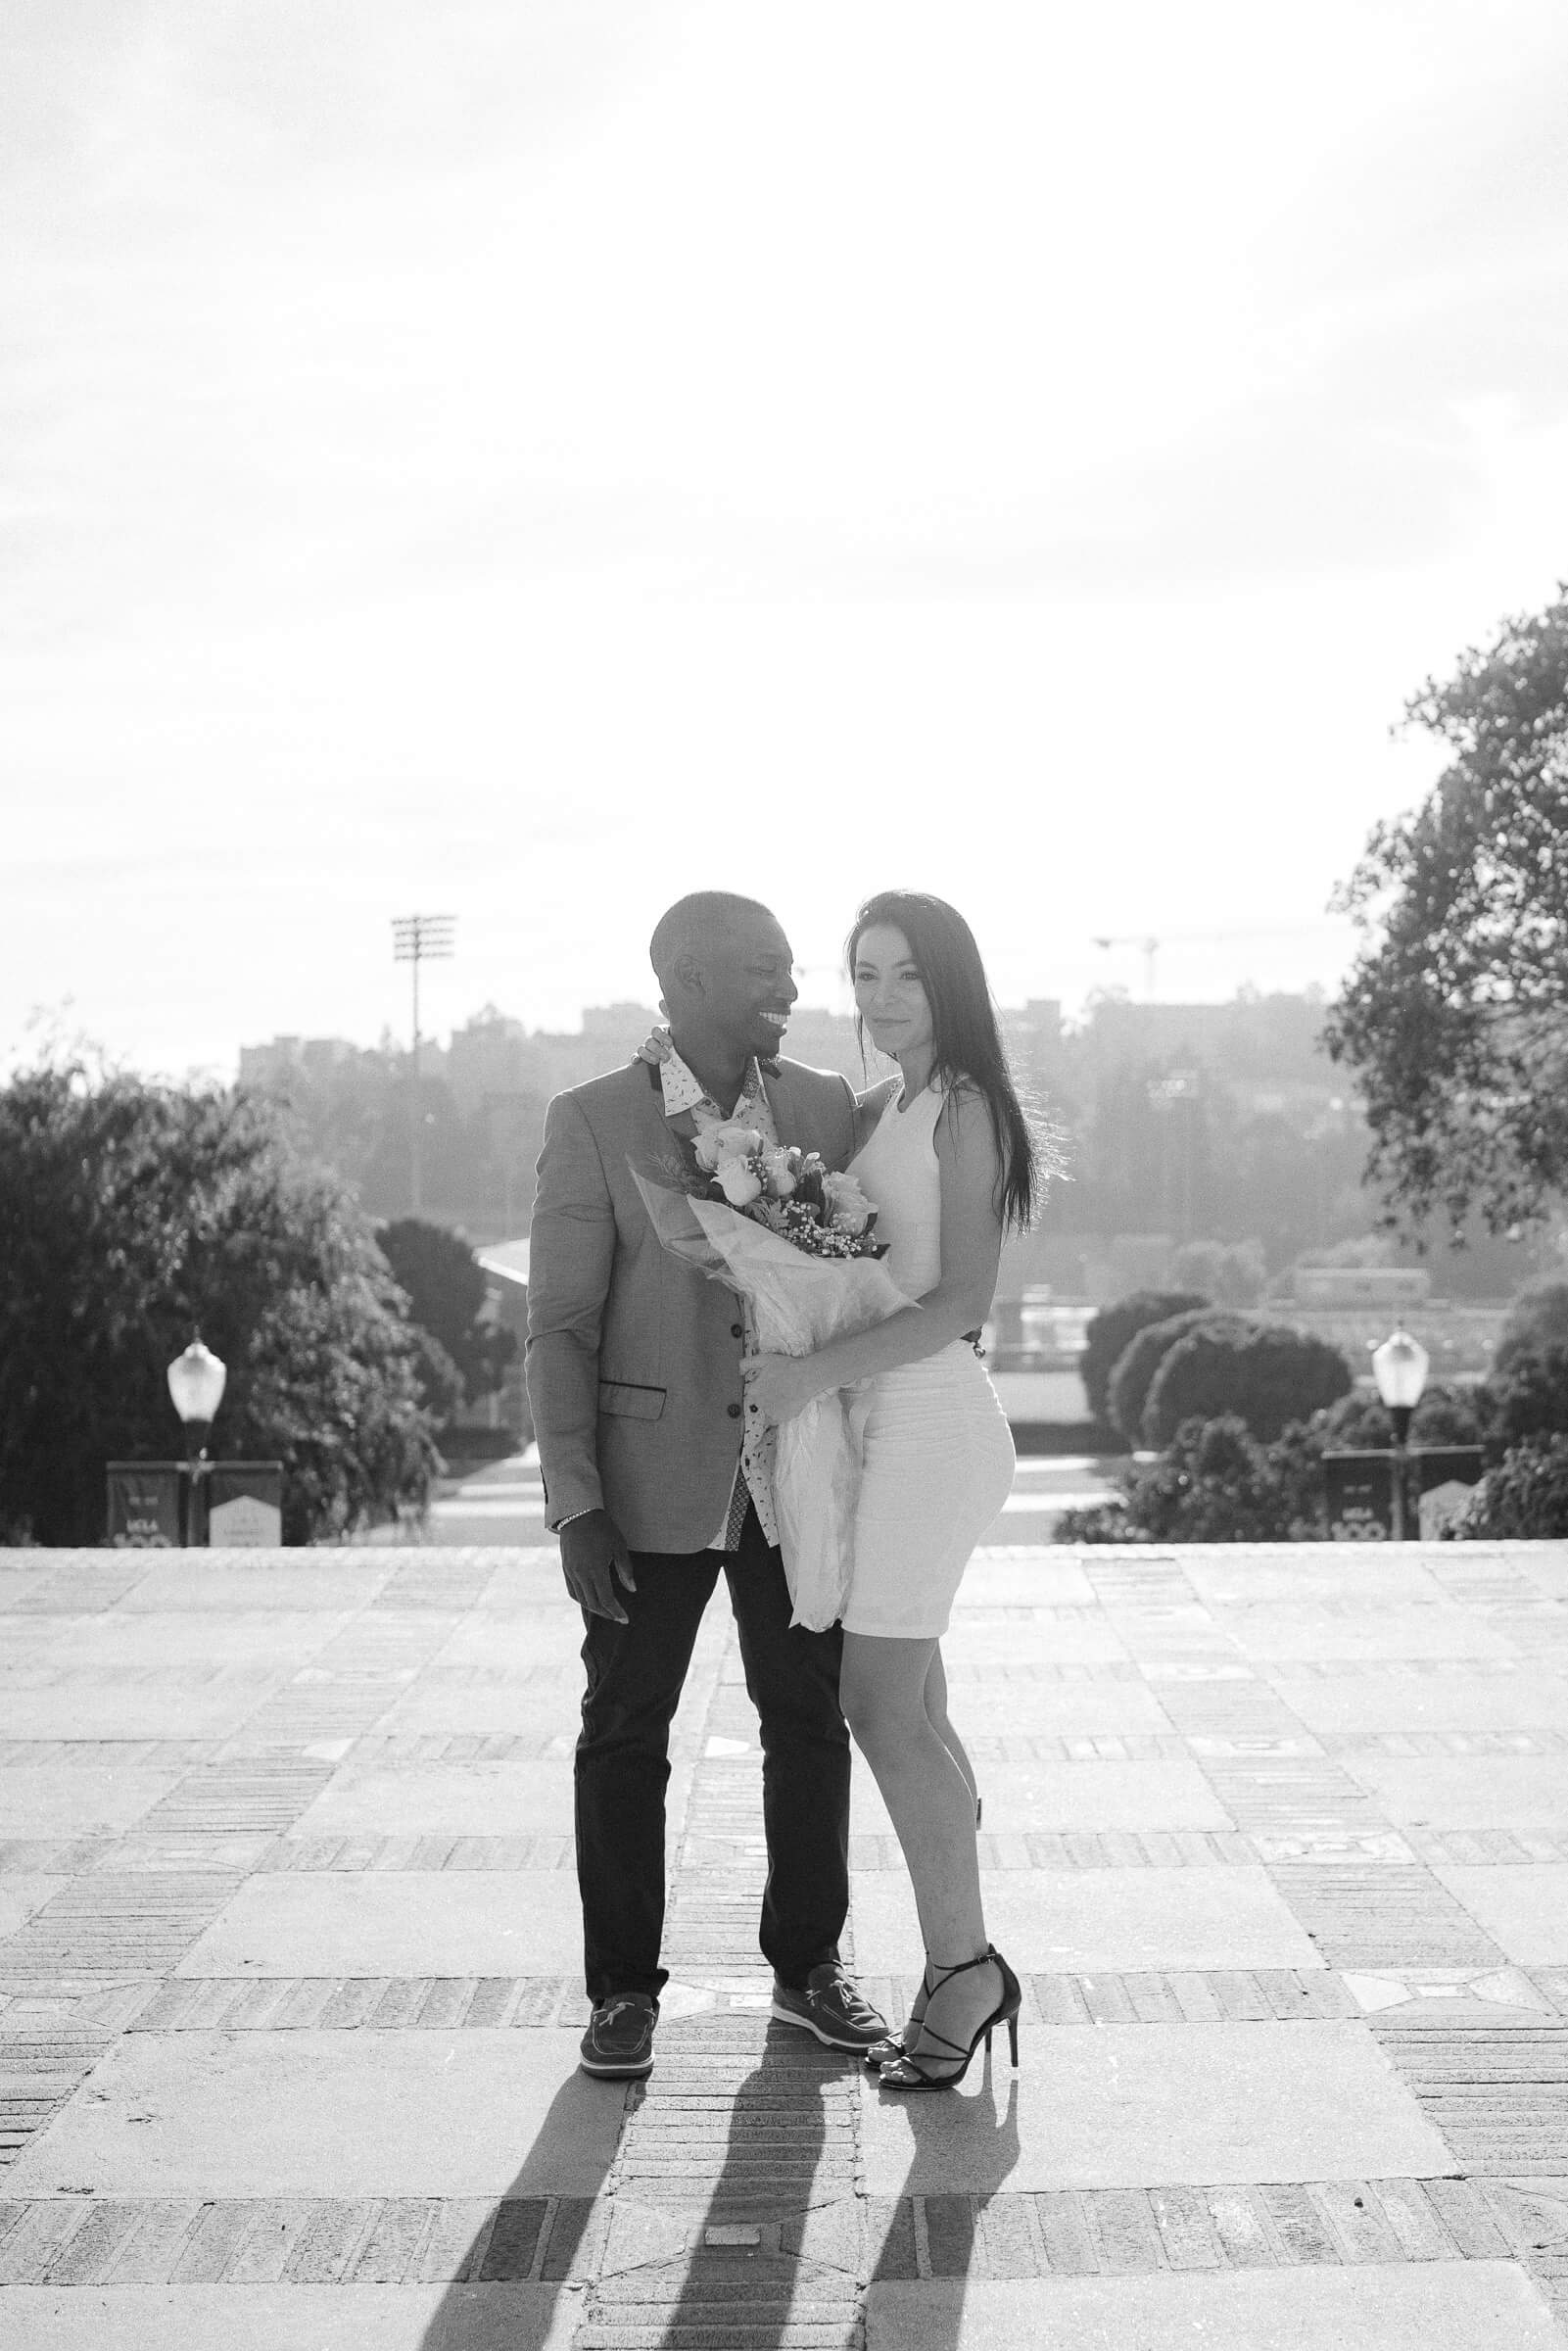 ucla-los-angeles-proposal-photographer-19.jpg